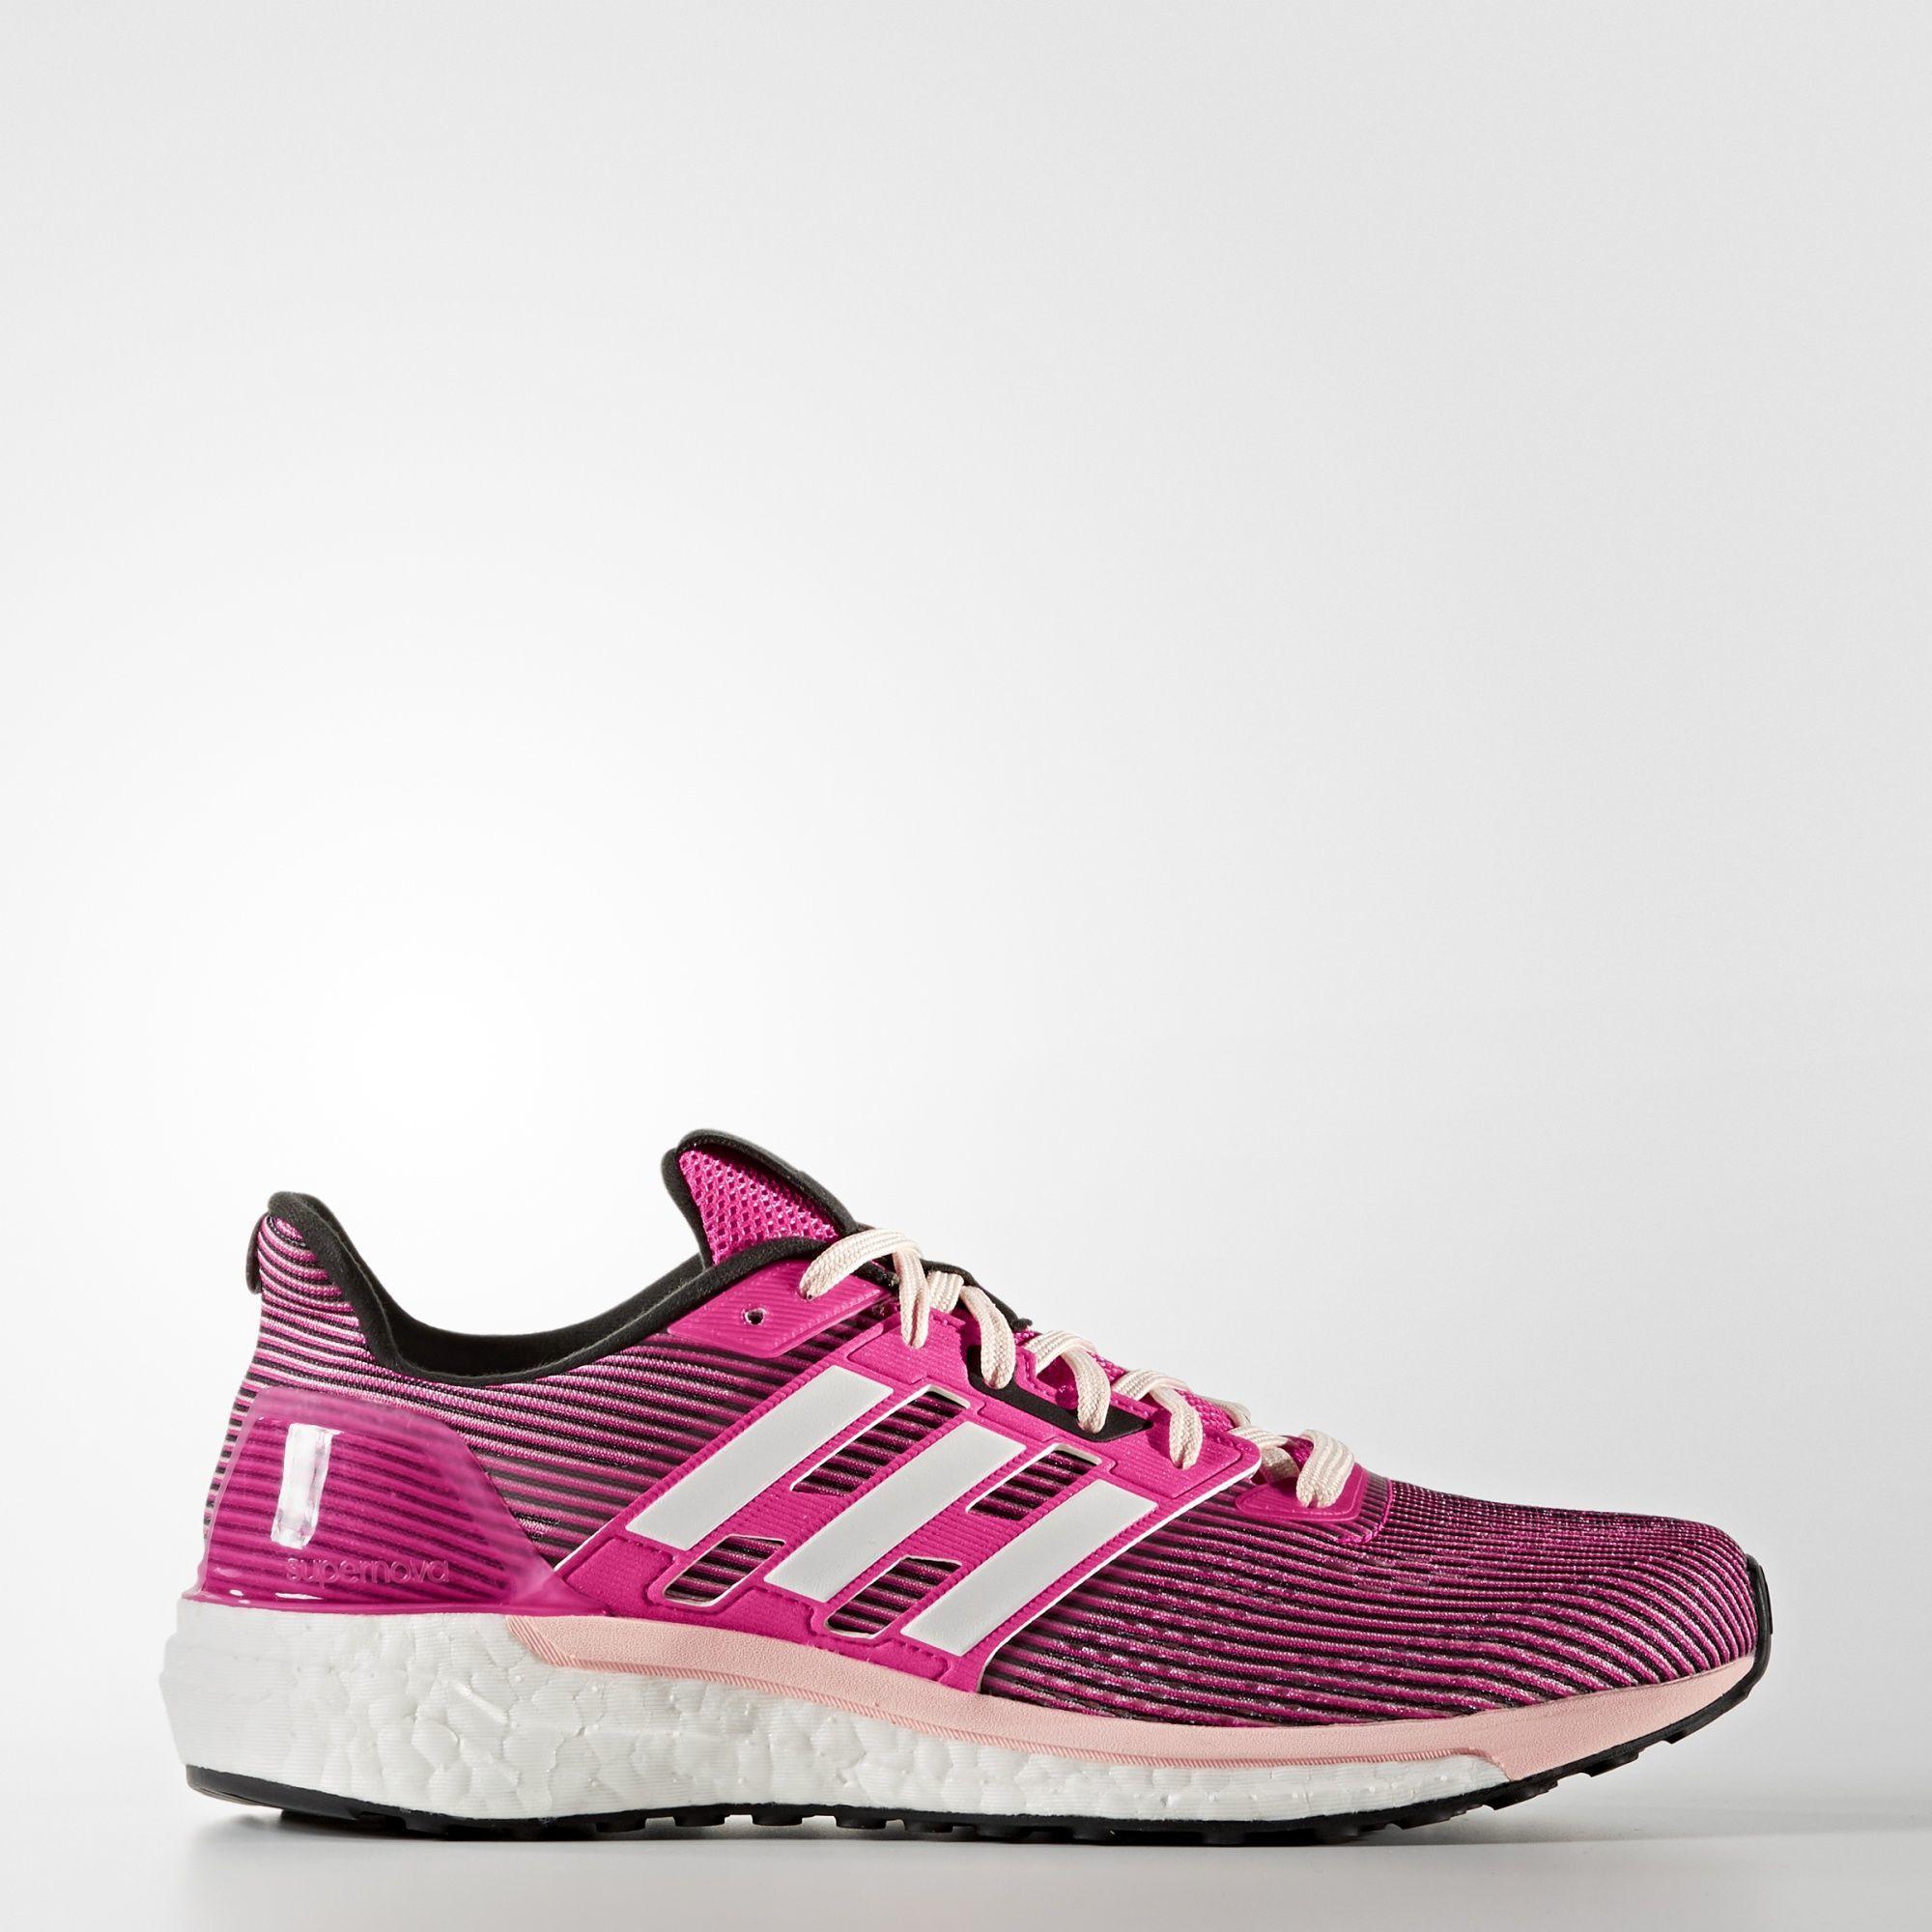 adidas Supernova w (Pink)